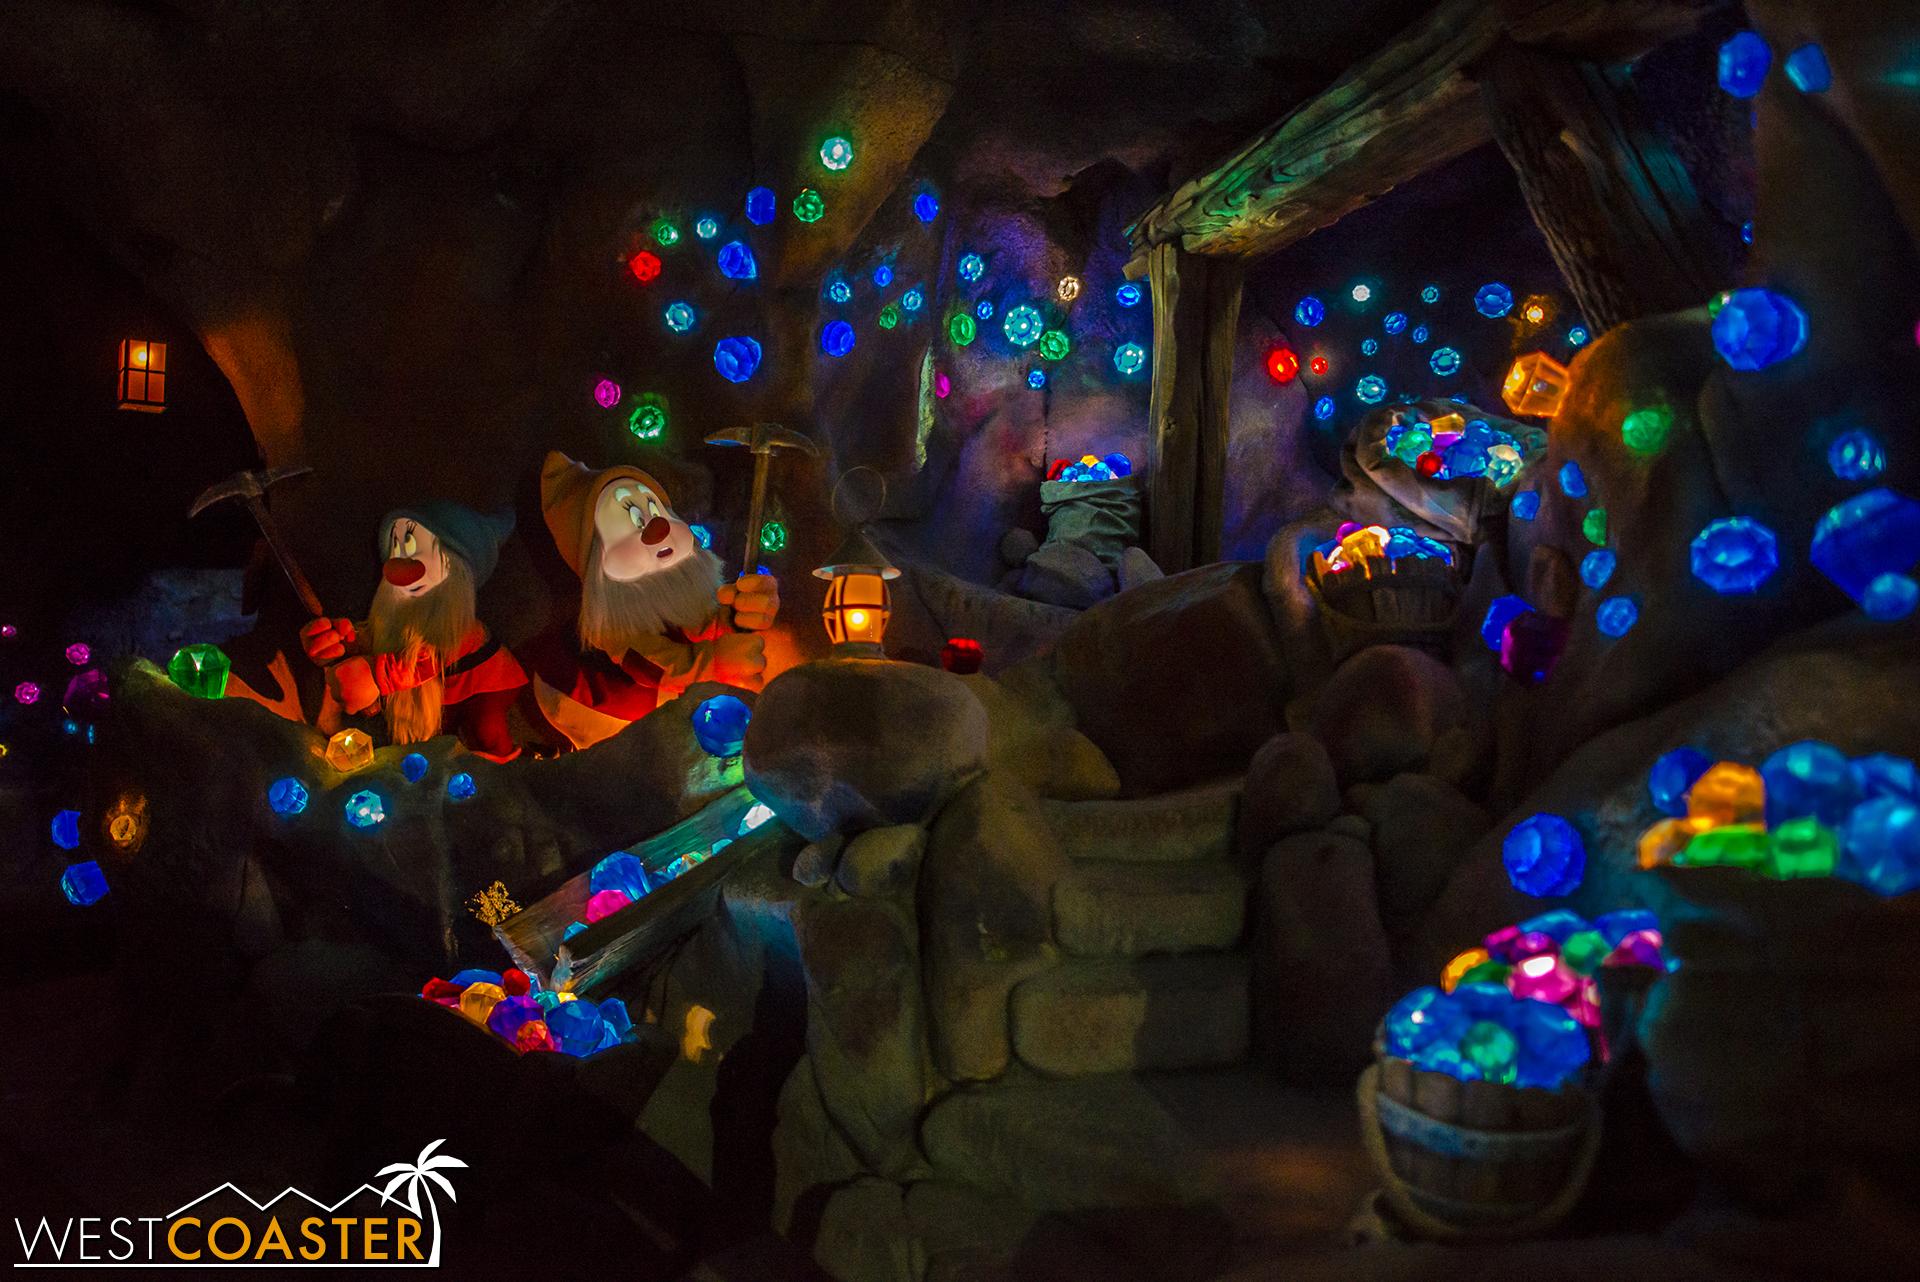 Inside the Seven Dwarfs Mine Train.